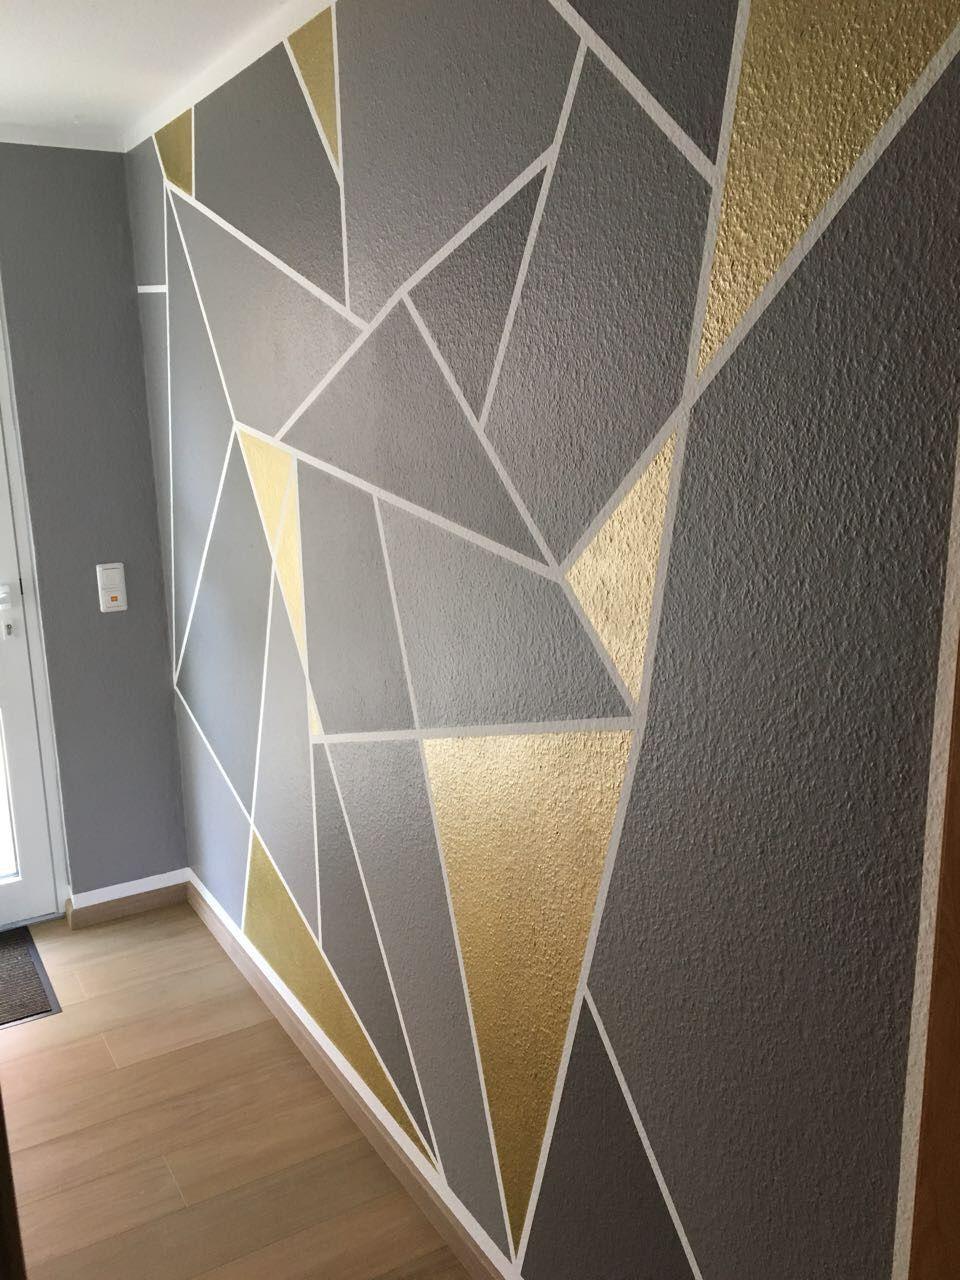 Geometrisches Wand Design Wand Muster Wand Muster Bedroom Wall Designs Bedroom Wall Paint Geometric Decor